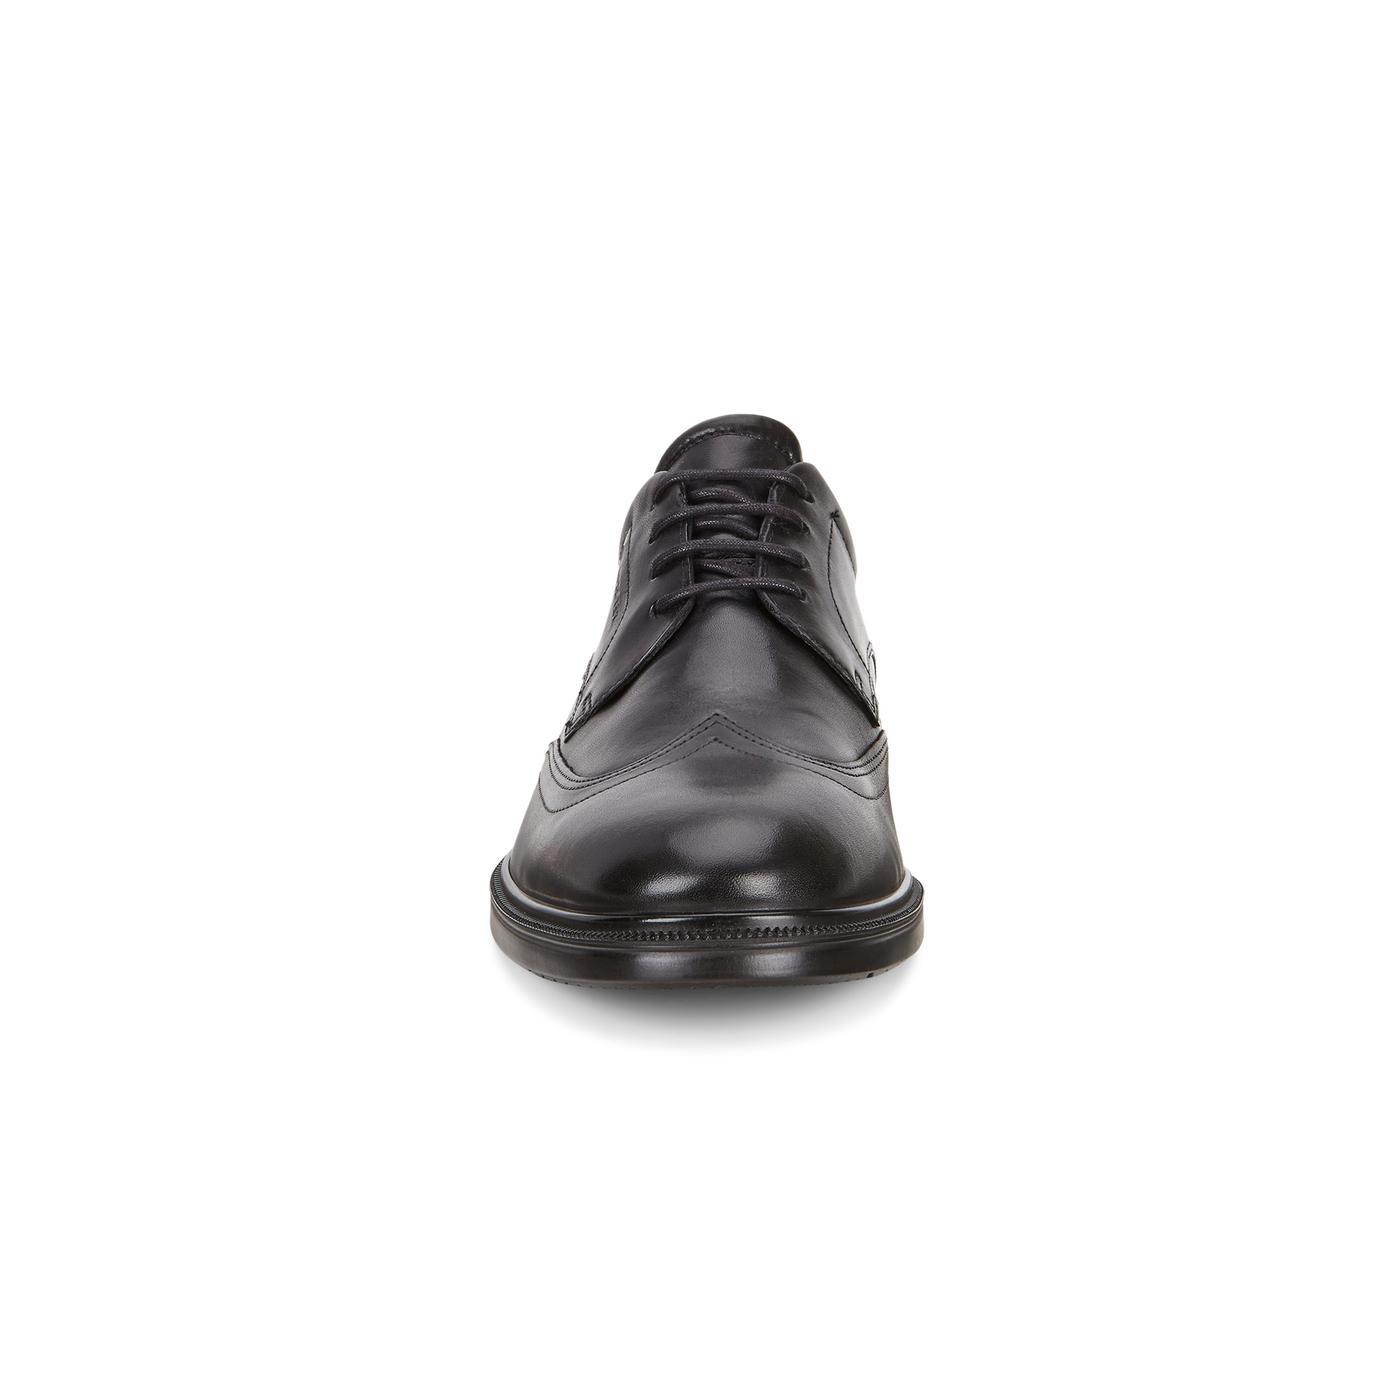 ECCO LISBON Stitched Plain Toe Gore-Tex